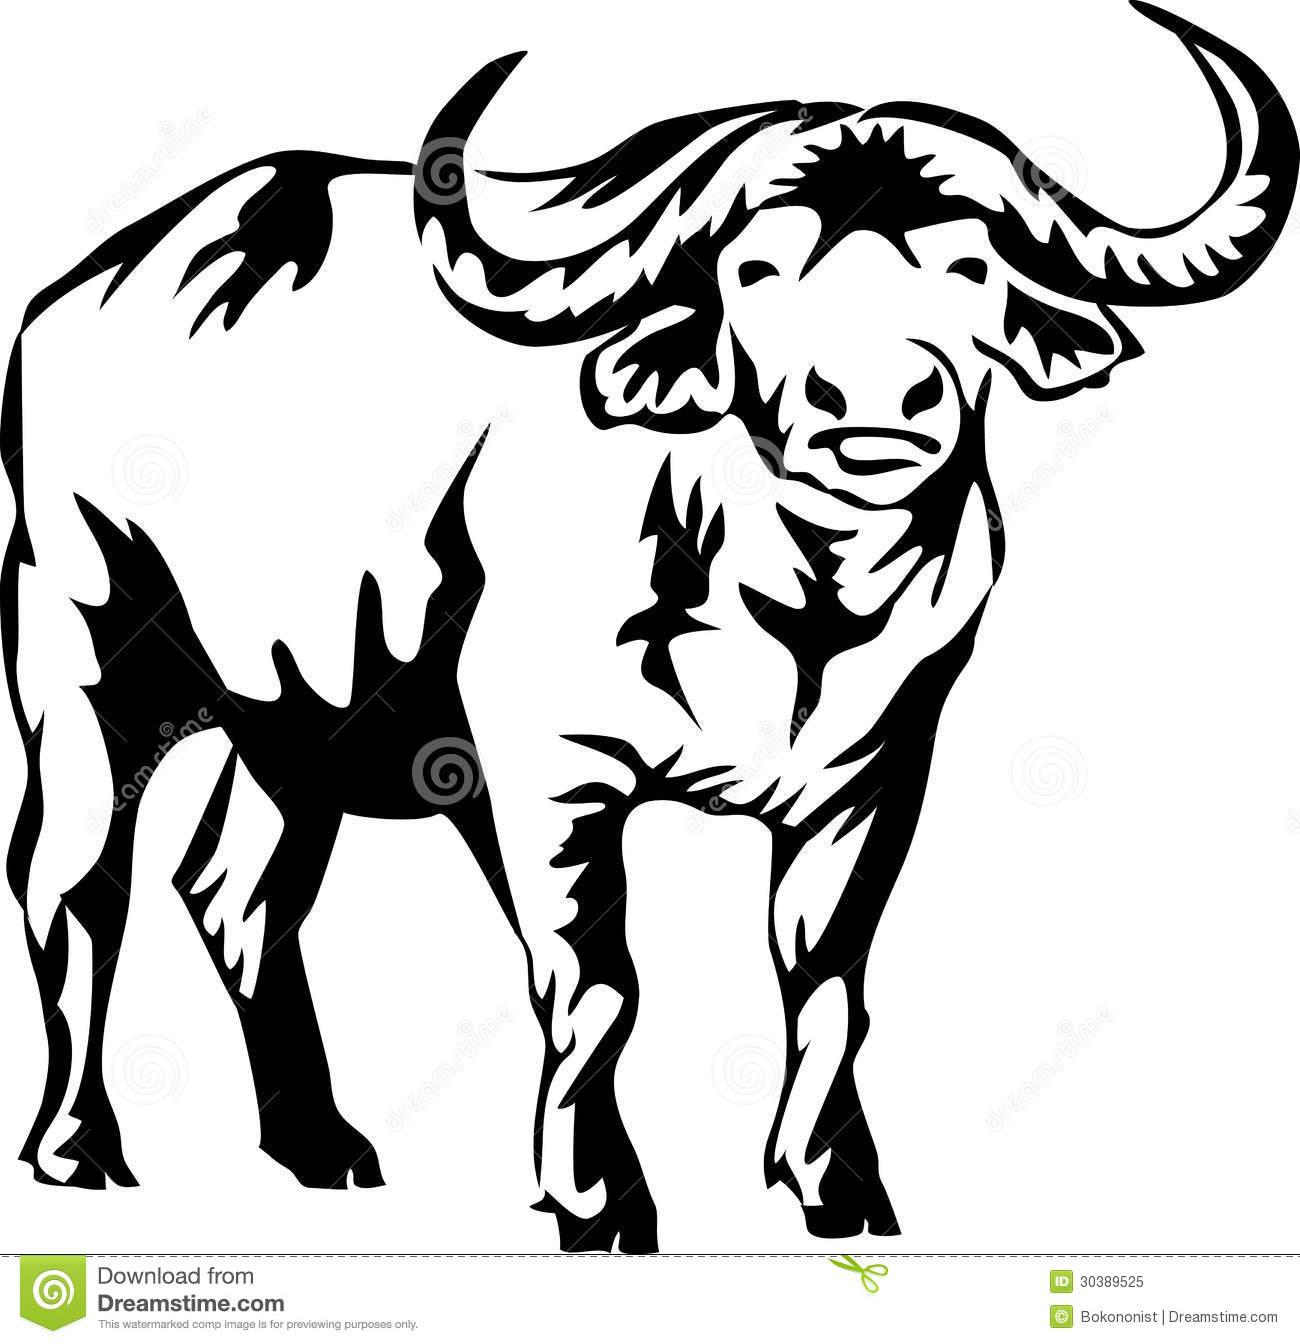 Profile of buffalo blackk and white clipart clip royalty free library Buffalo Clipart Free   Free download best Buffalo Clipart ... clip royalty free library